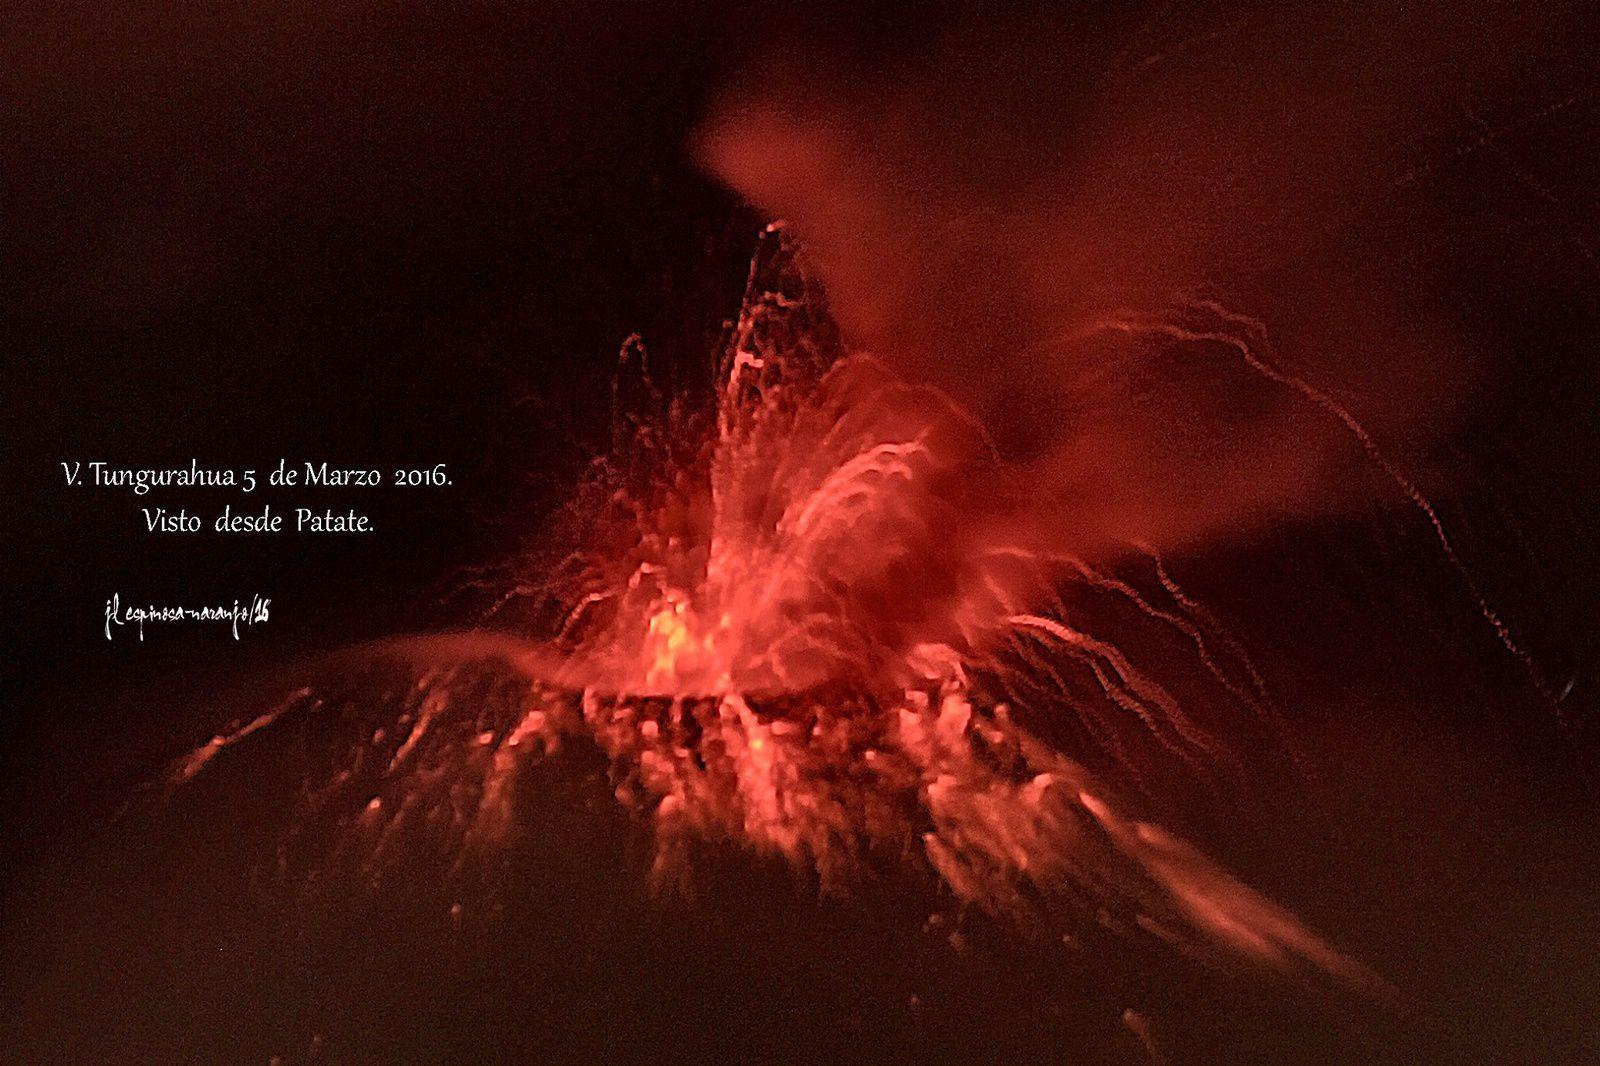 Tungurahua - strombolian activity 03.05.2016 / 9:47 p.m. - photo Jose Luis Espinosa-Naranjo from Patate